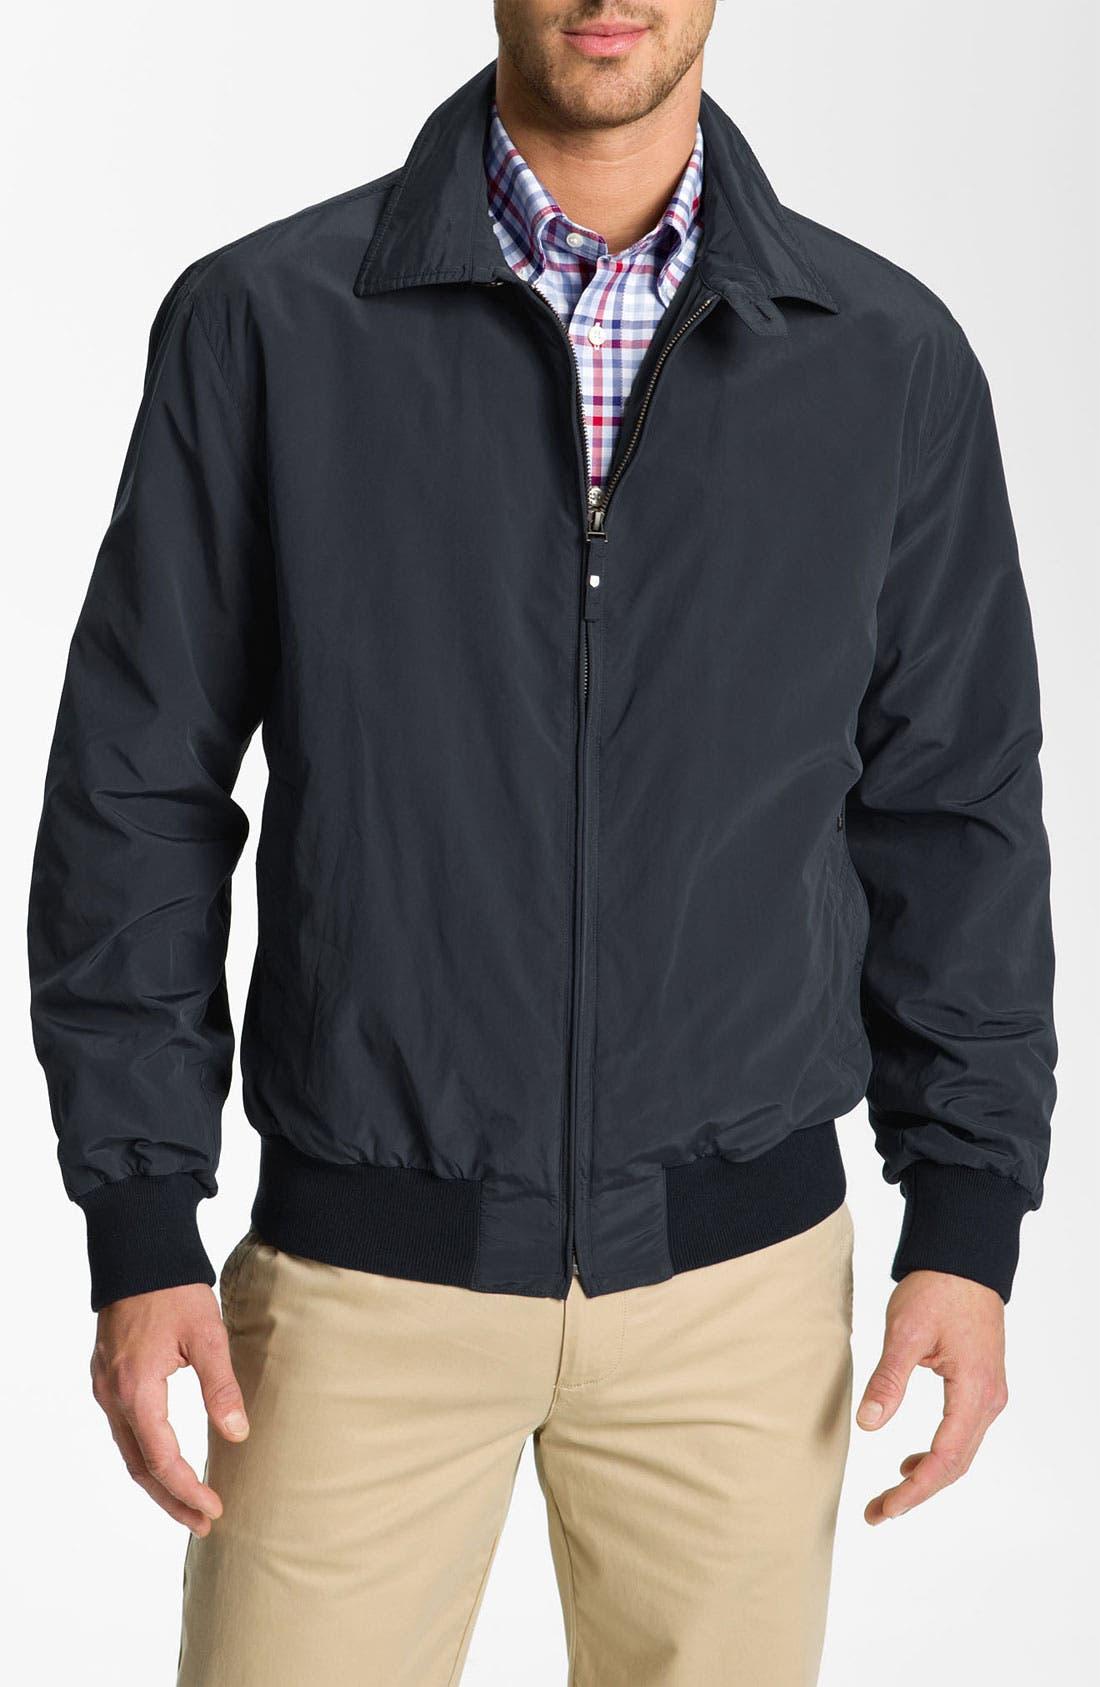 Main Image - Façonnable Microfiber Jacket